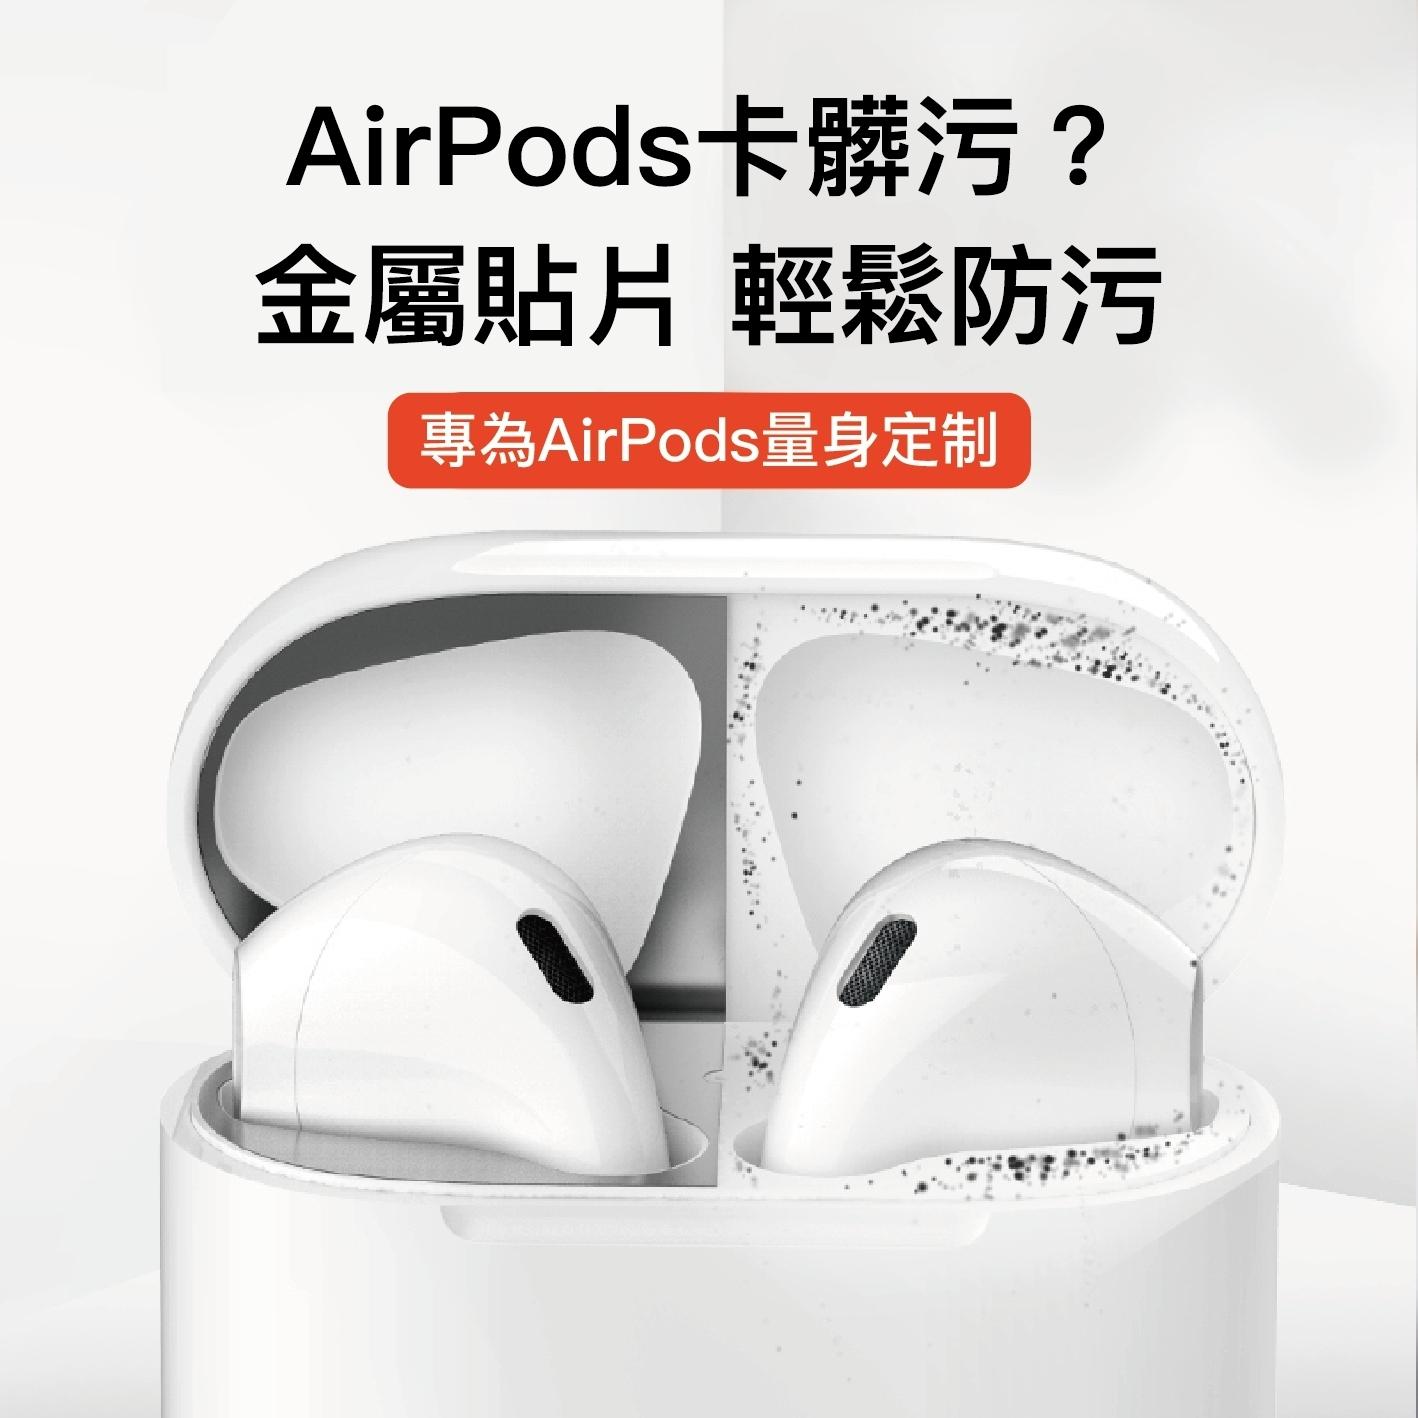 AHAStyle AirPods 防塵貼片 保護貼 鎳片 金屬